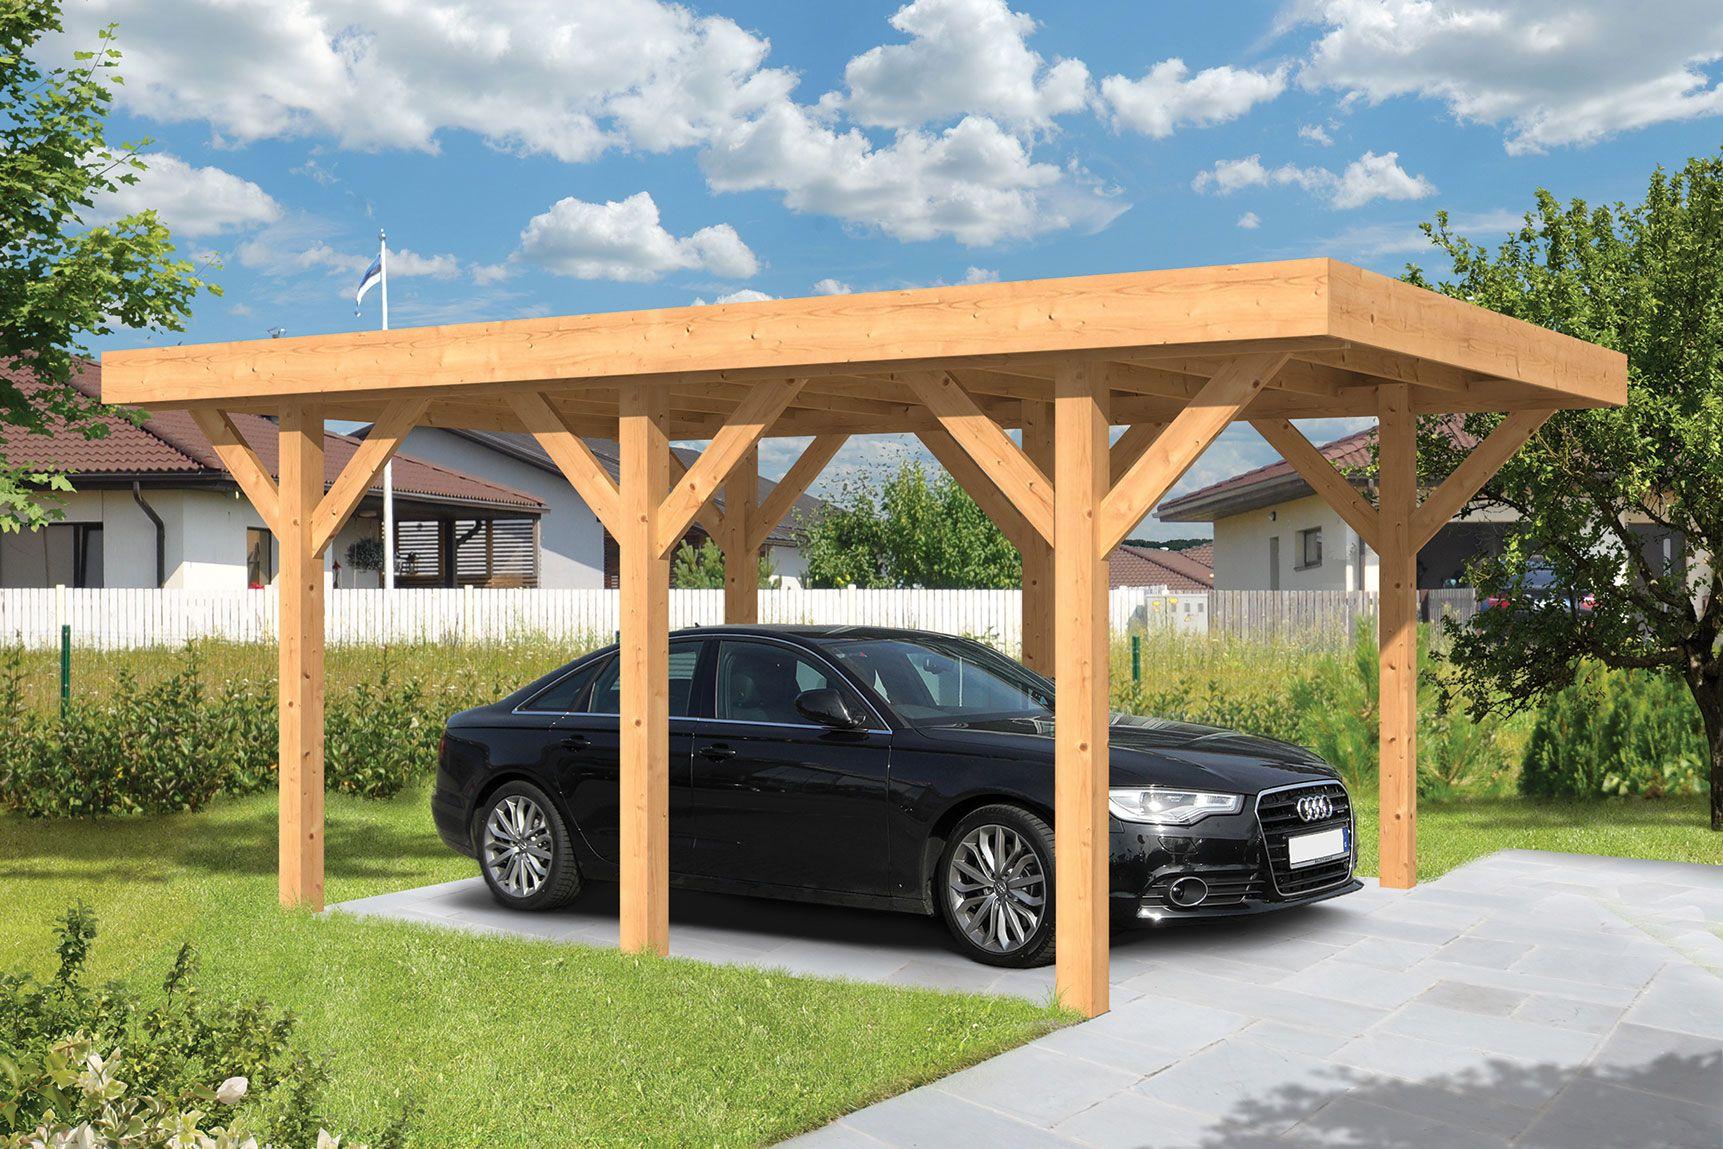 Houten Carport Lemmer 450 X 600 Cm Plat Dak Carport Platte Dak Dak